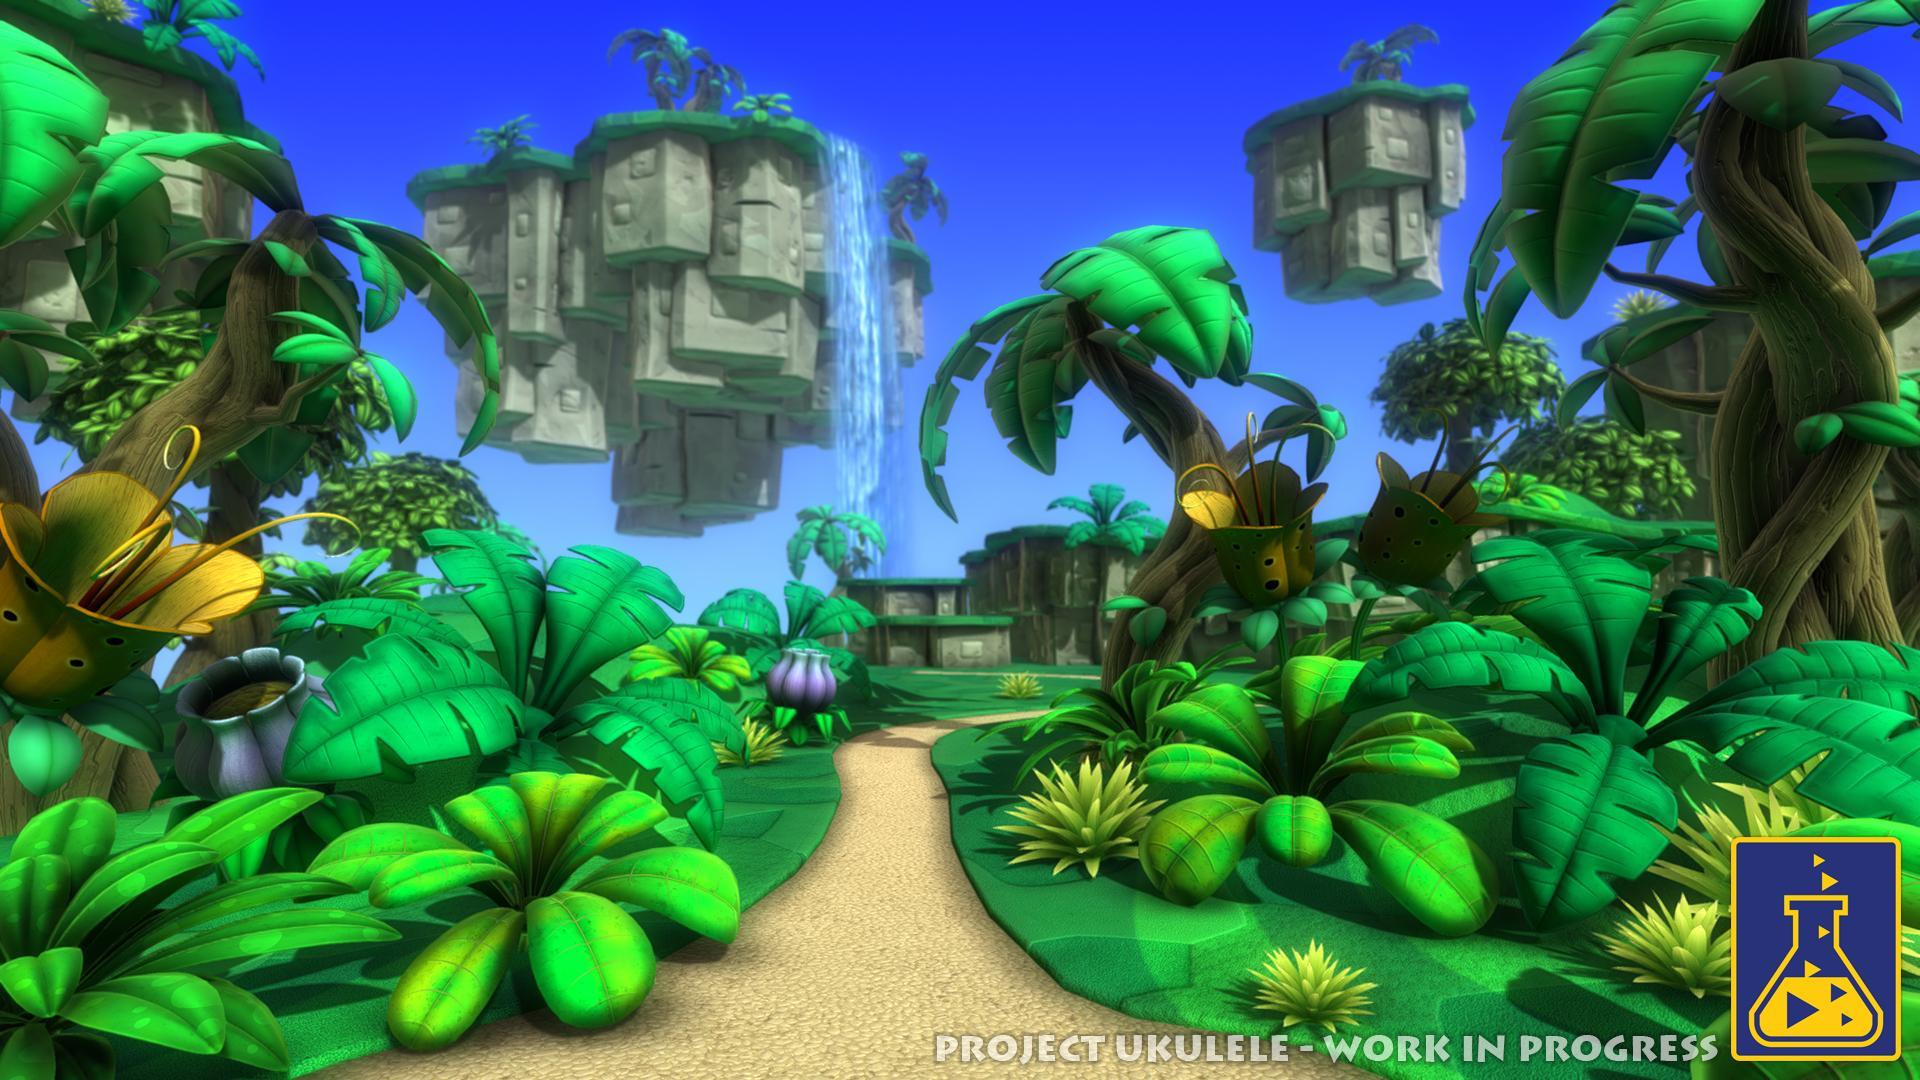 First Look At Playtonics Project Ukulele Kickstarter